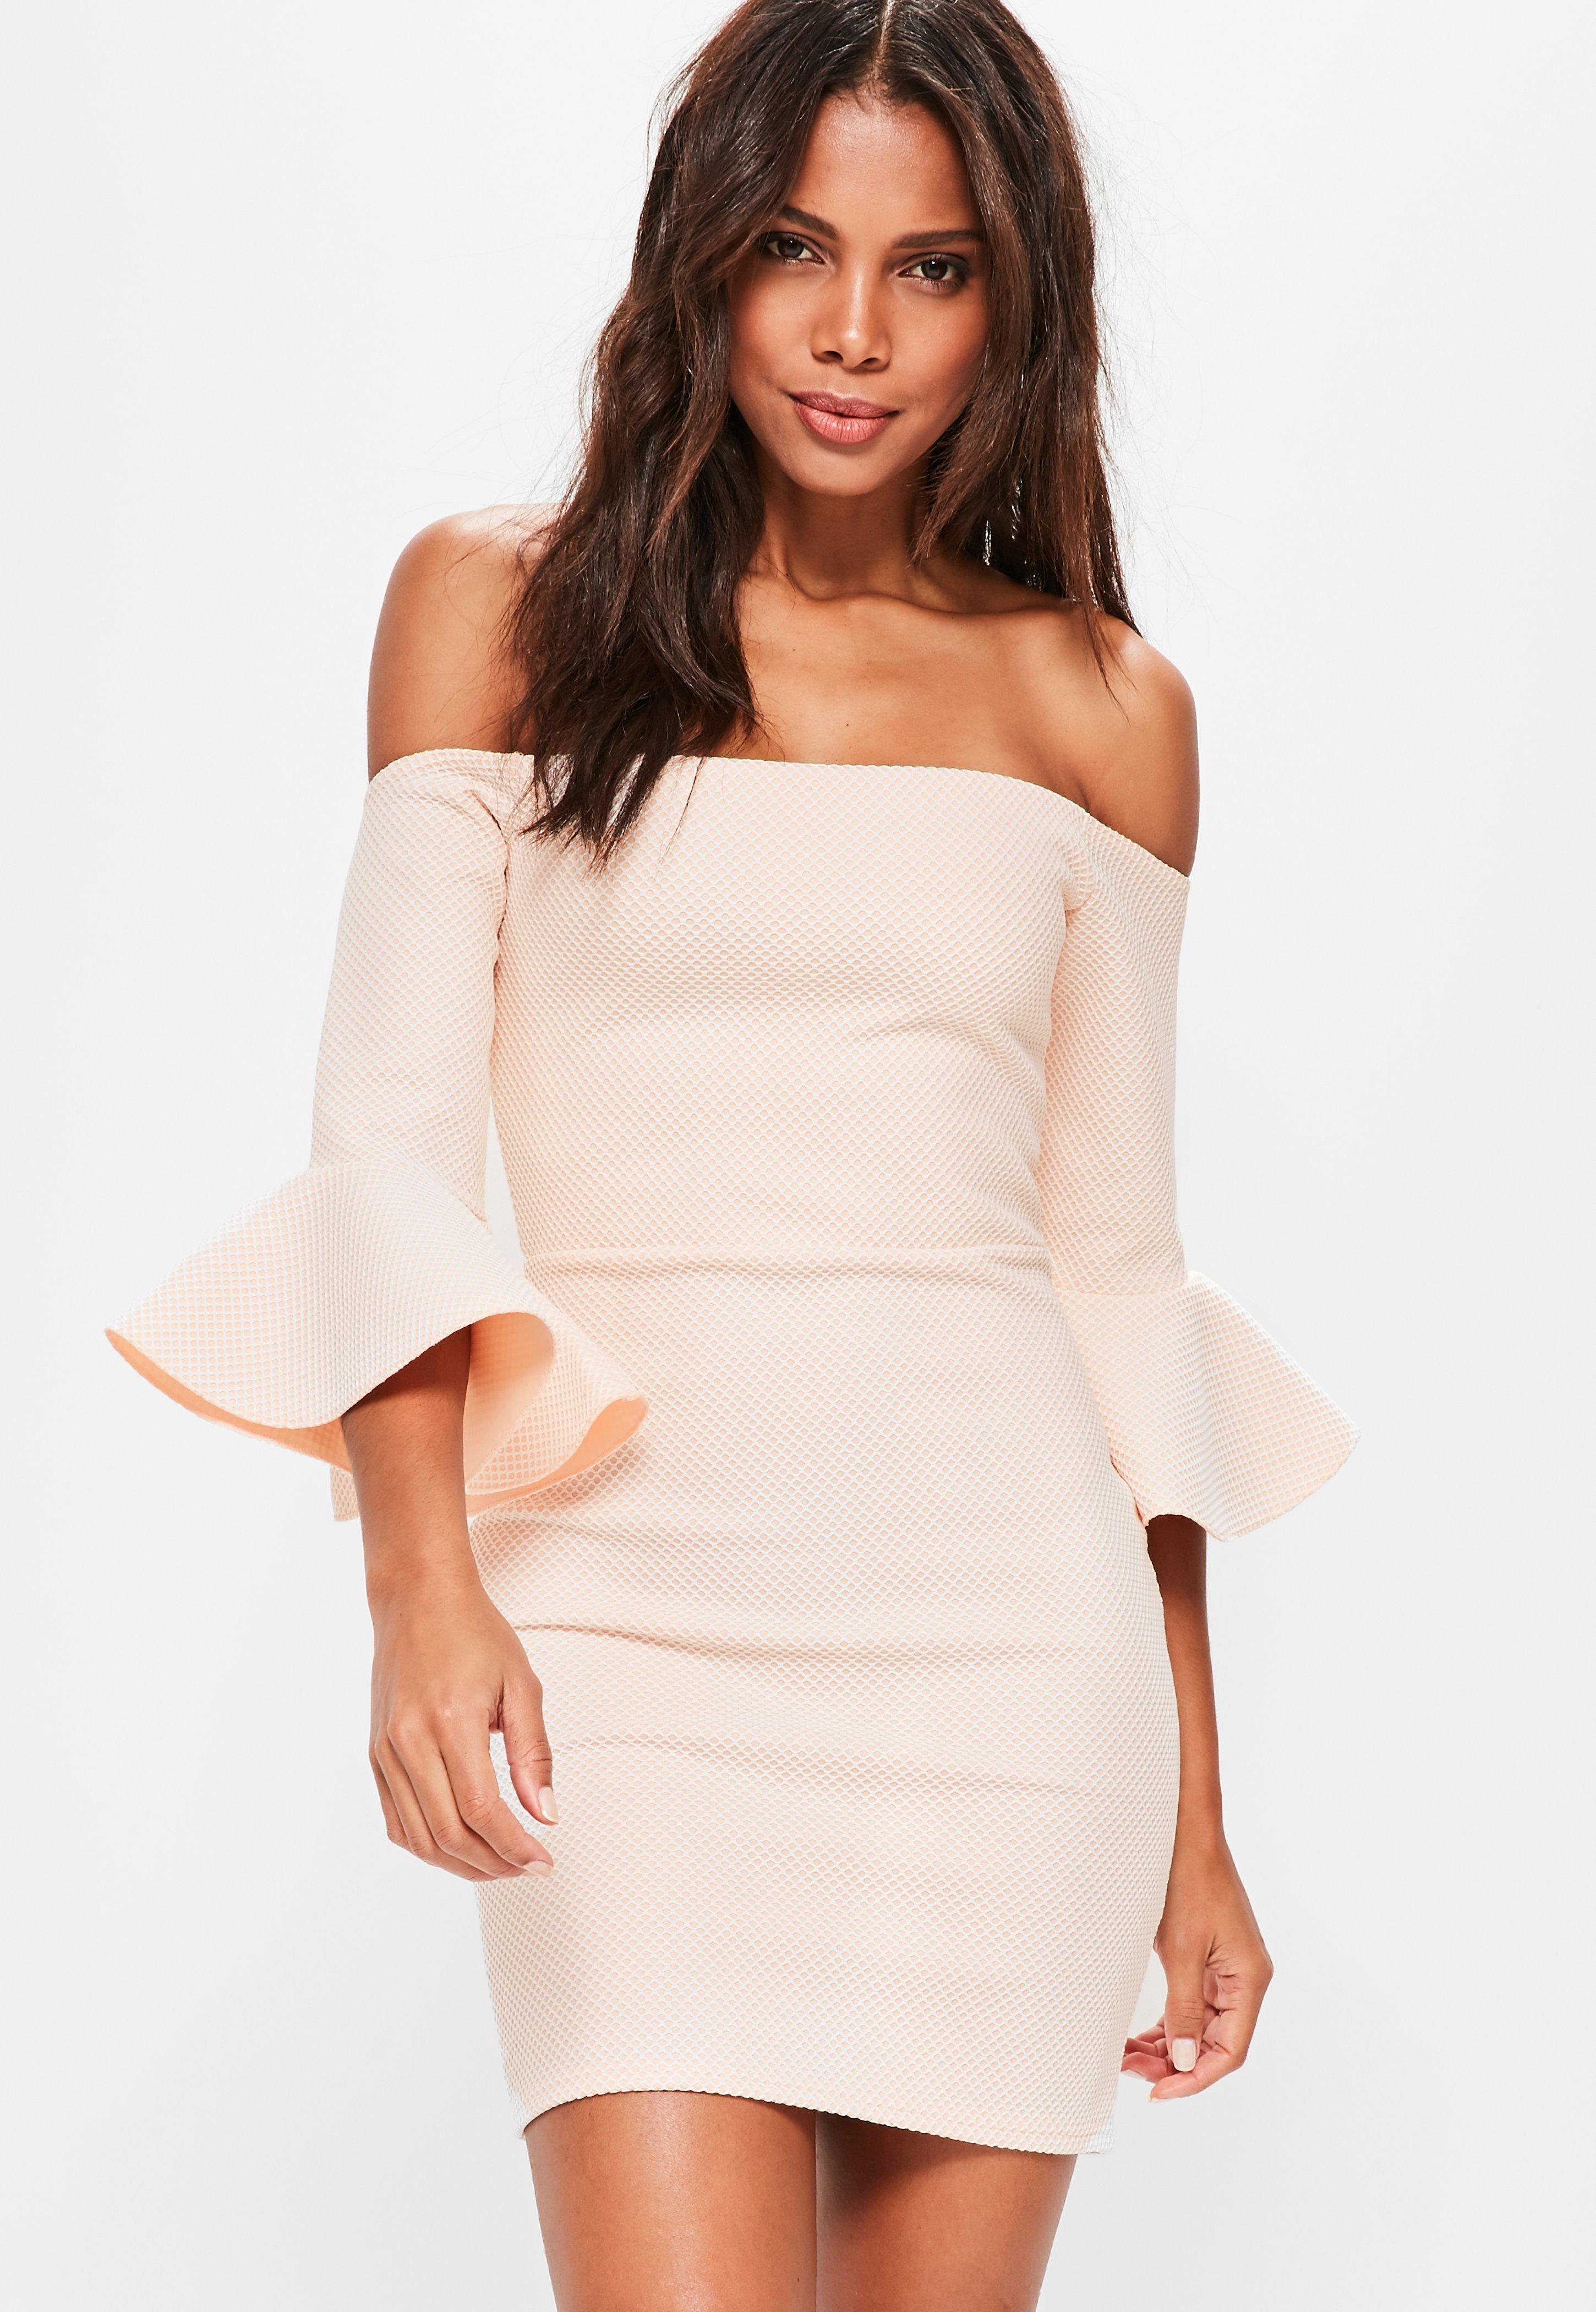 White Collar Detail Cut Detail Bodycon Dress Pretty Little Thing X0VhPjkdQ